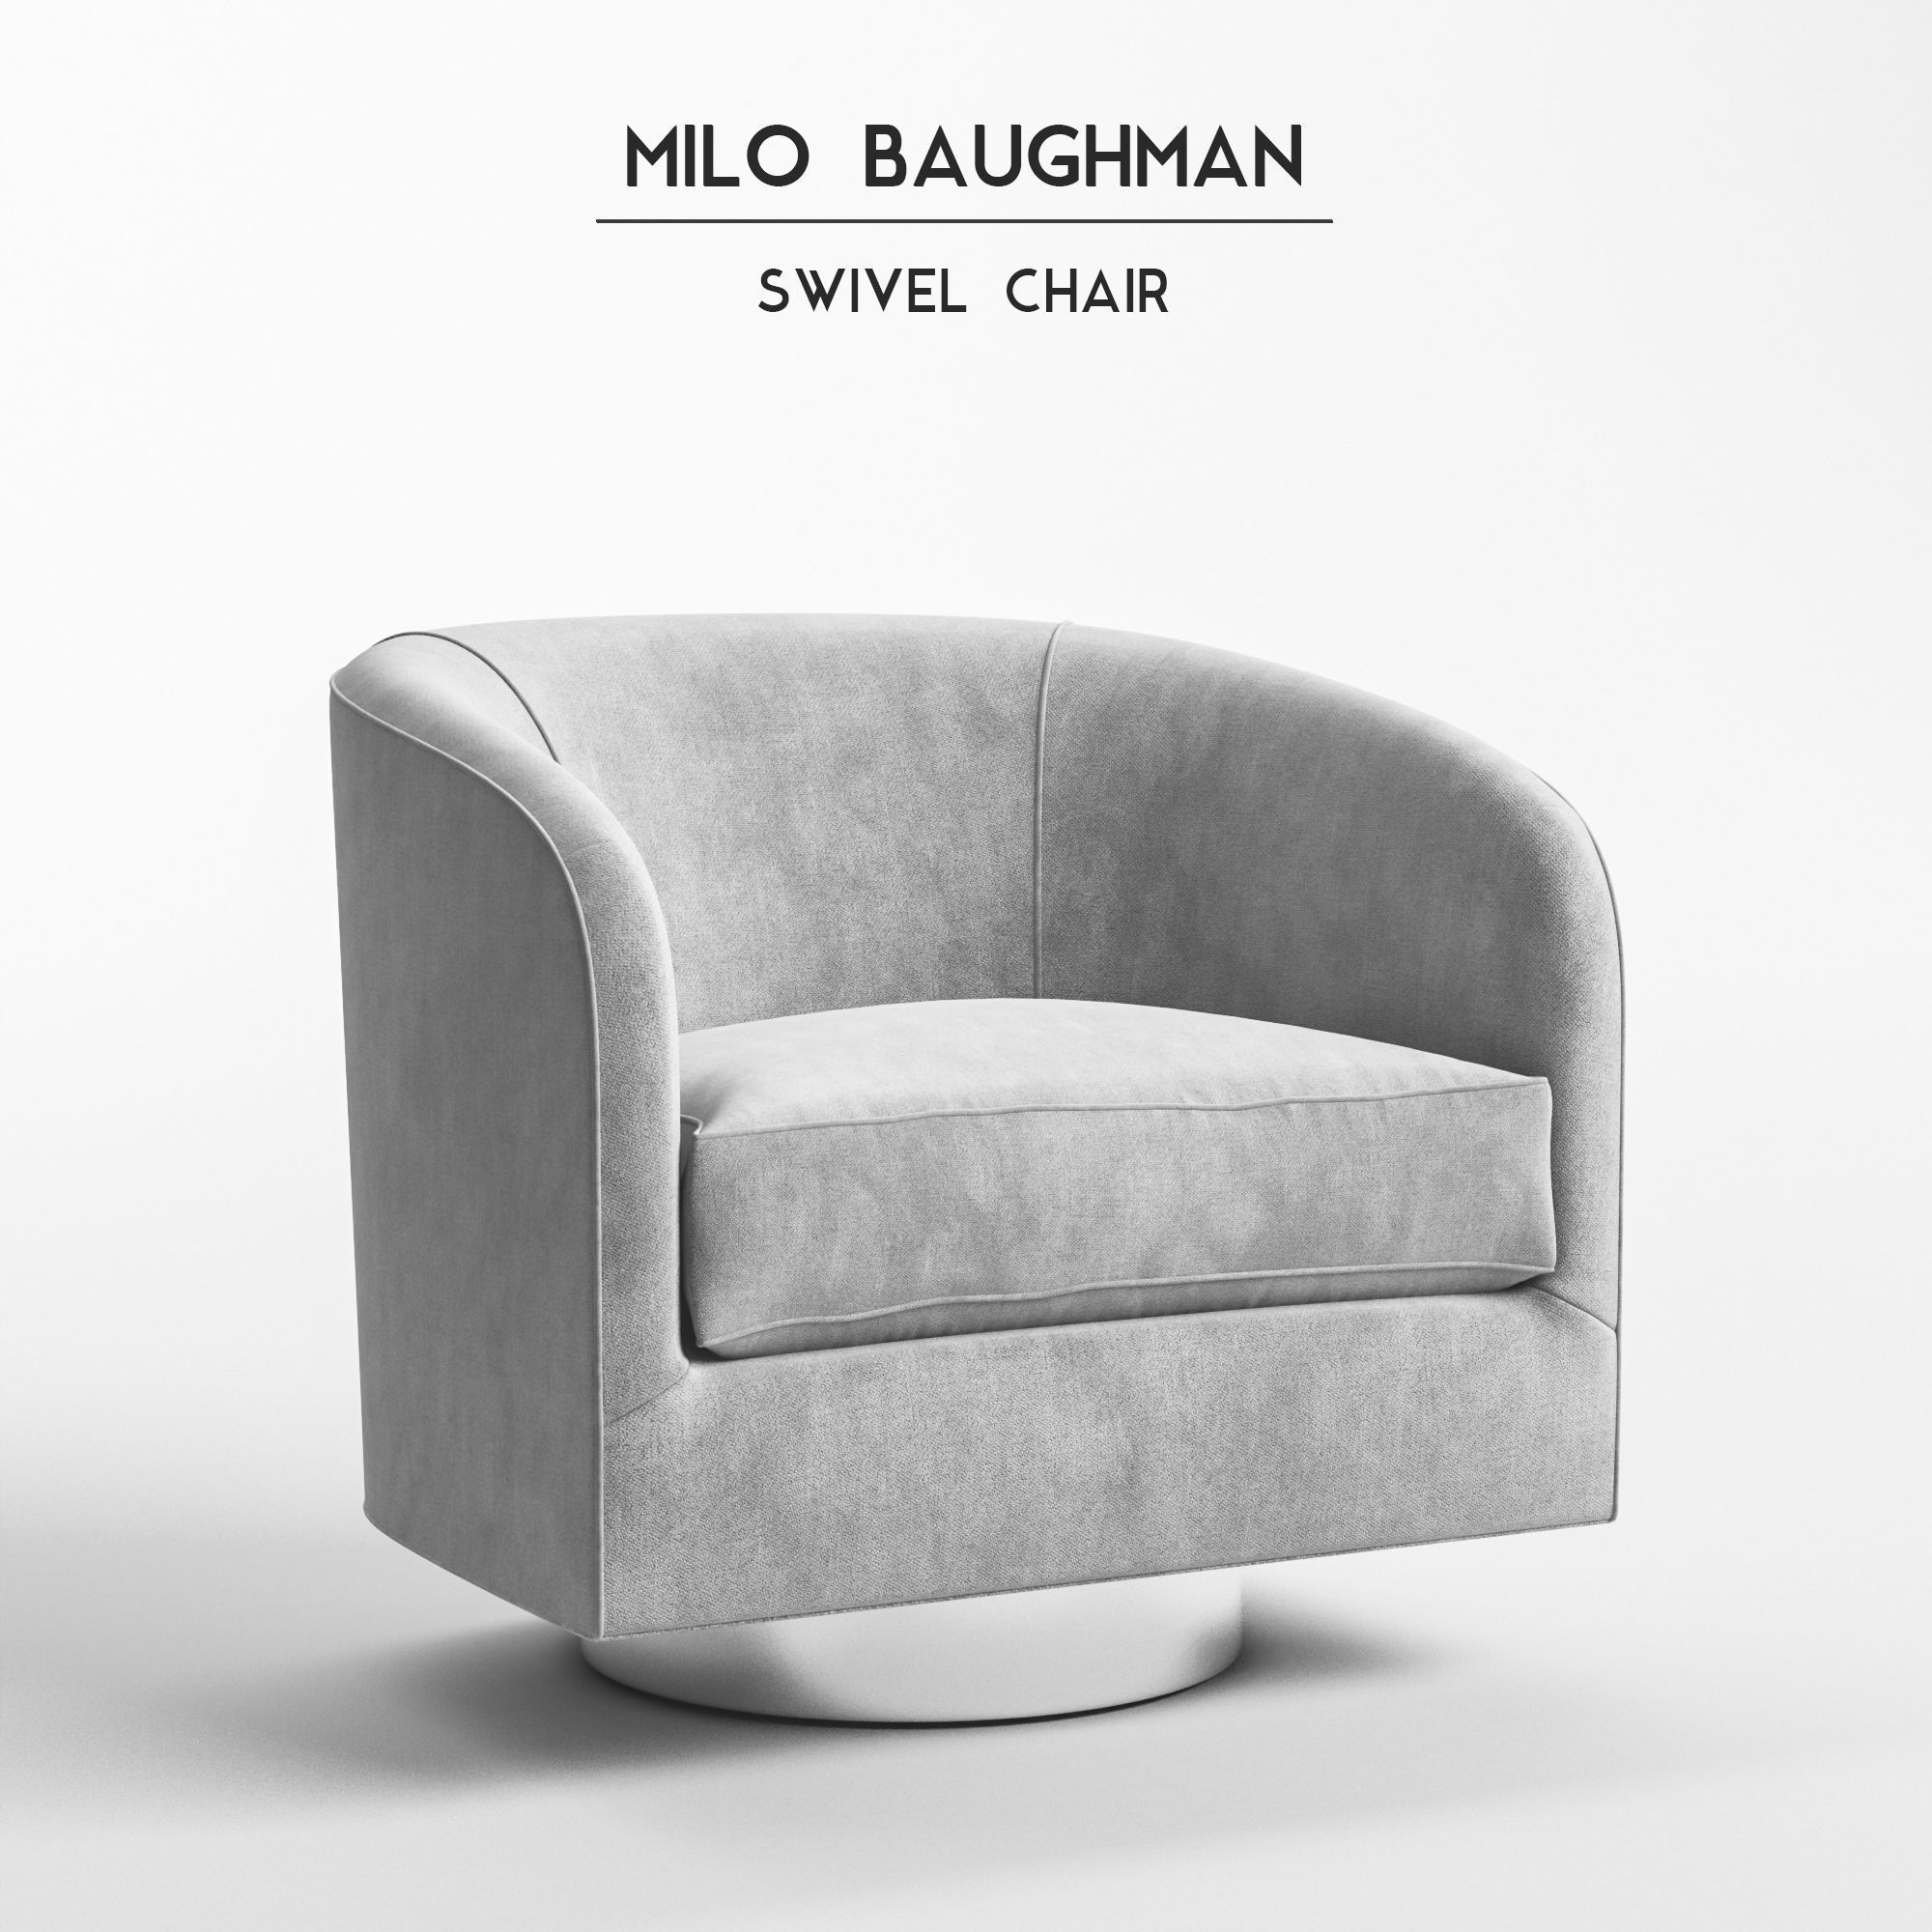 Milo Baughman - Swivel Chair model